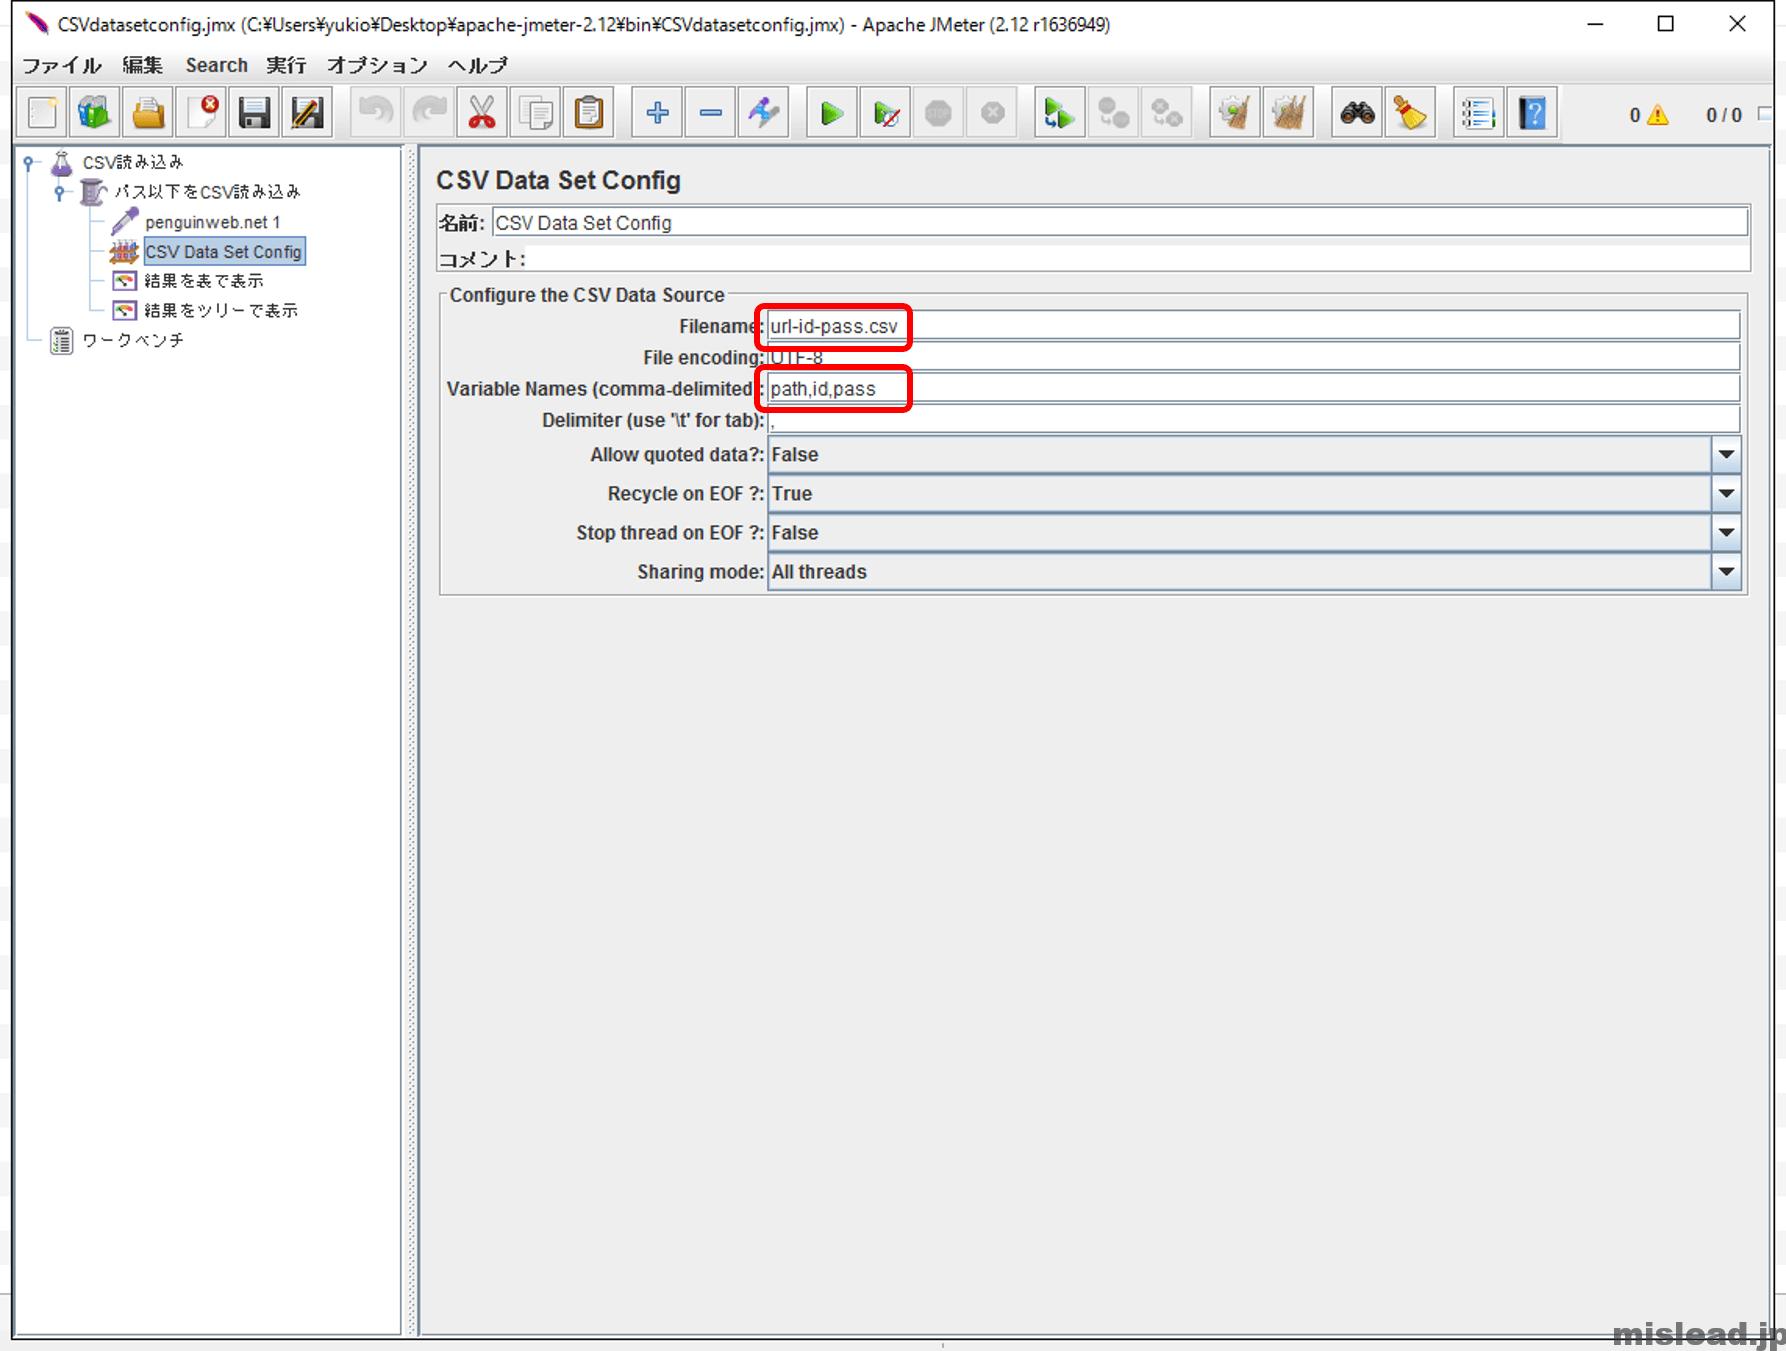 JMeter CSV DATA Set Configでファイル名と変数名の指定